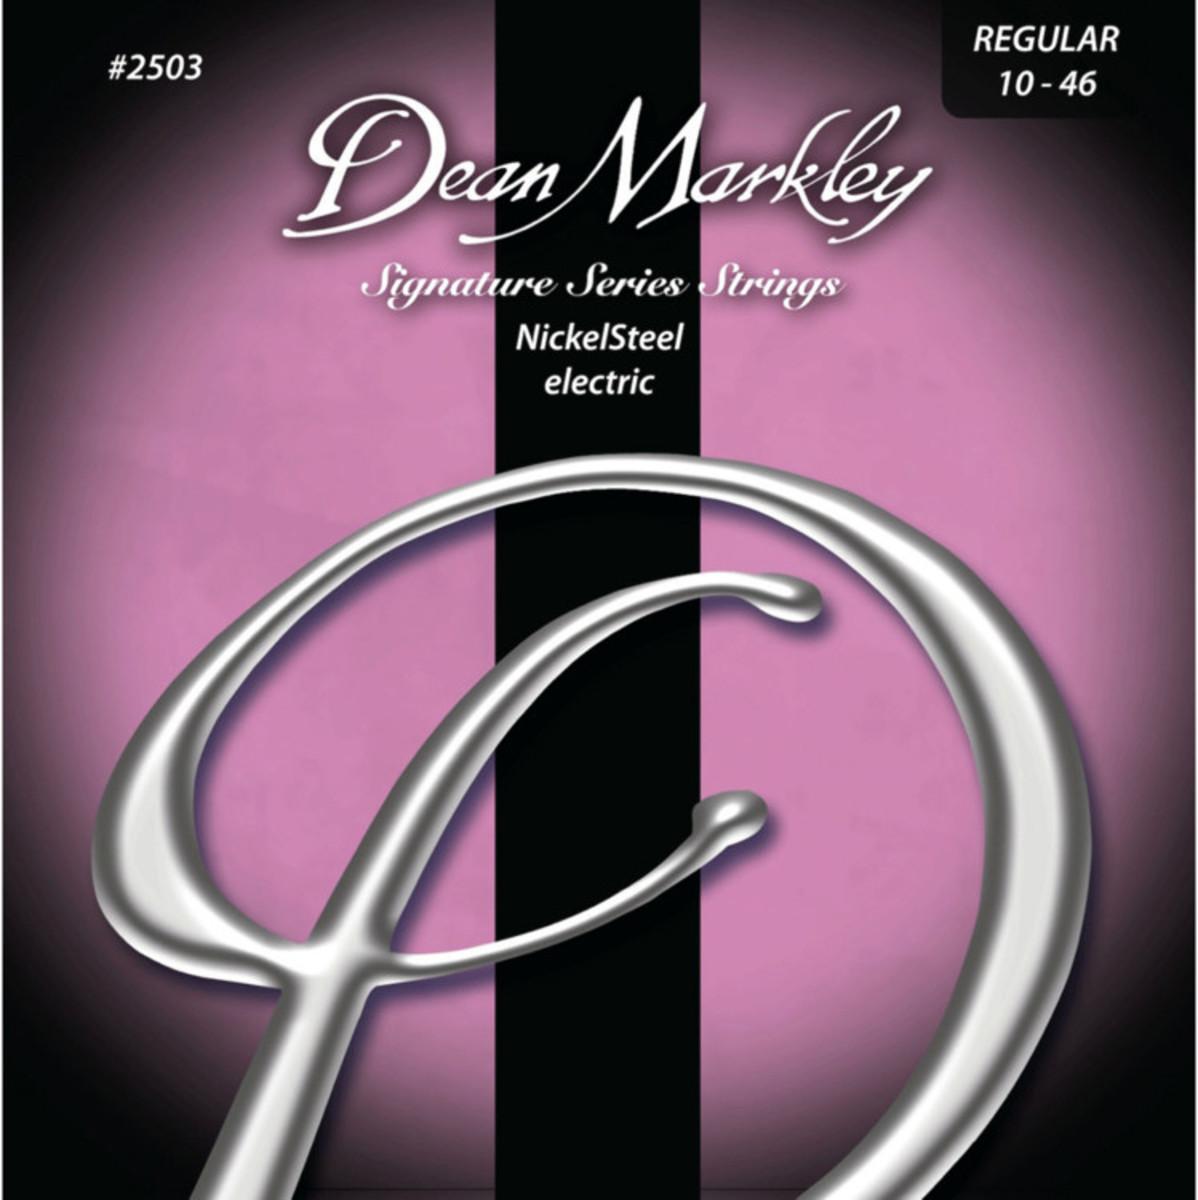 Image of Dean Markley Regular Electric Signature Guitar Strings 10-46